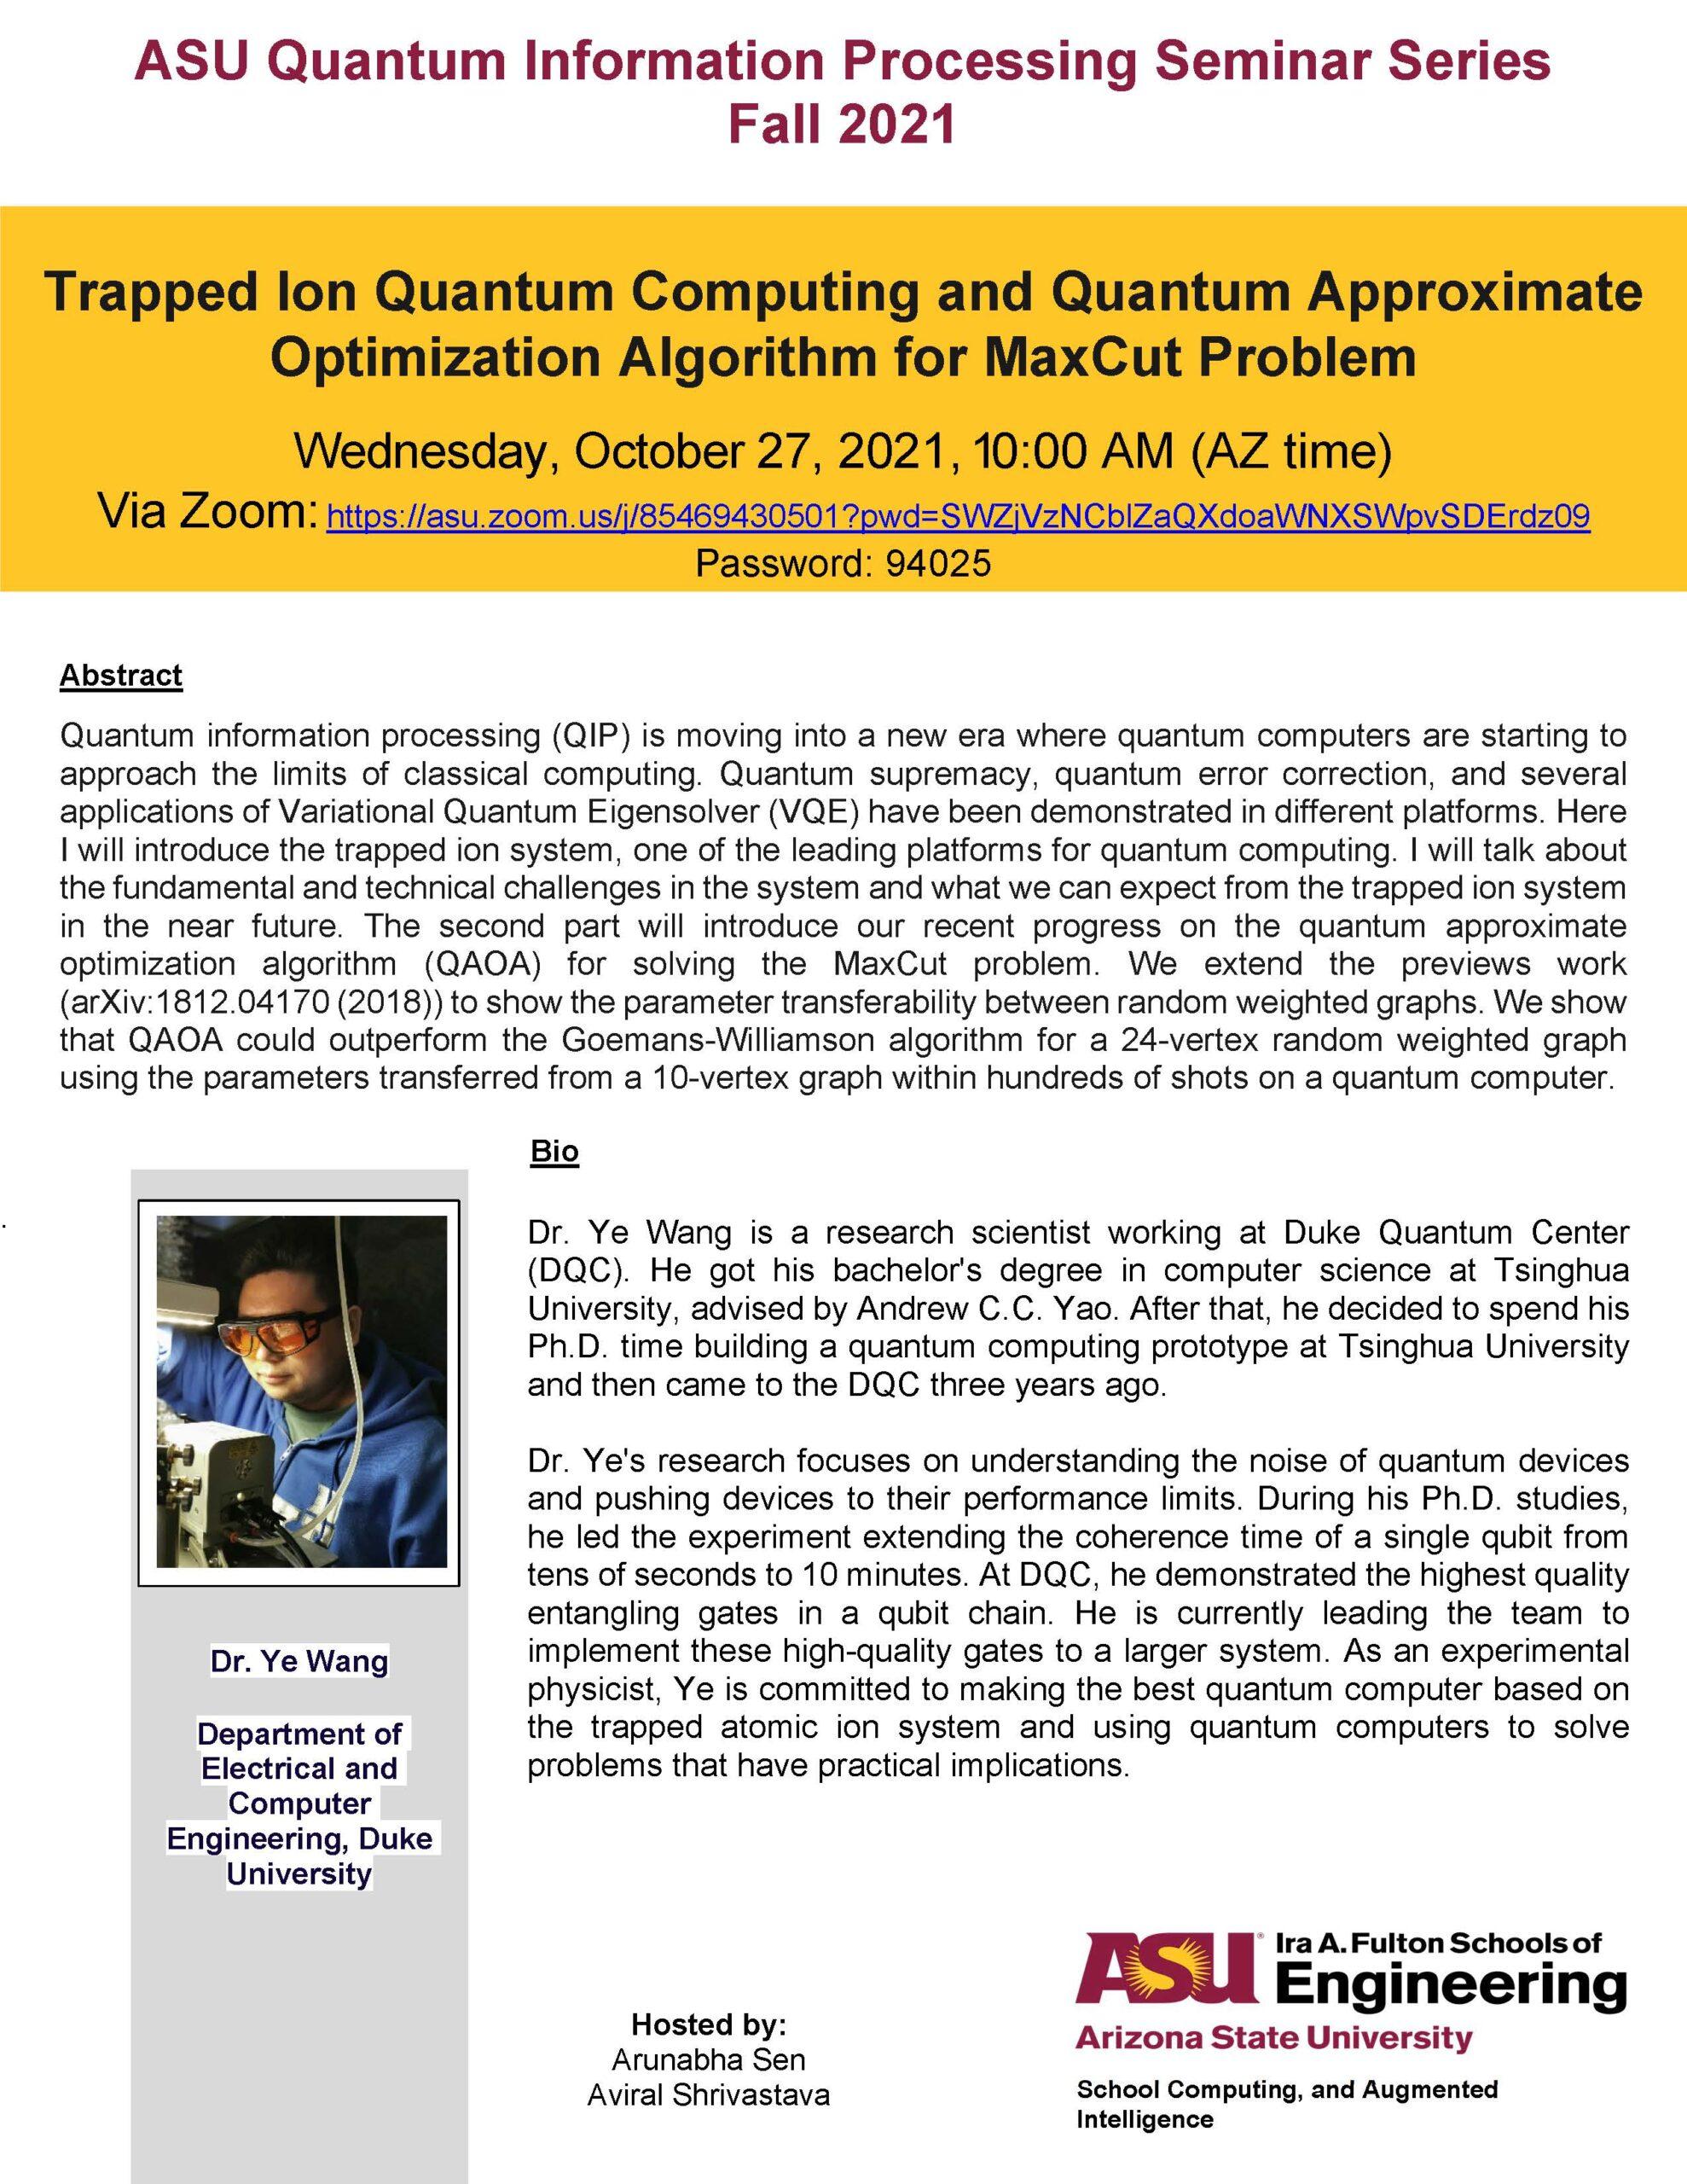 Seminar: Trapped Ion Quantum Computing and Quantum Approximate Optimization Algorithm for MaxCut Problem, October 27